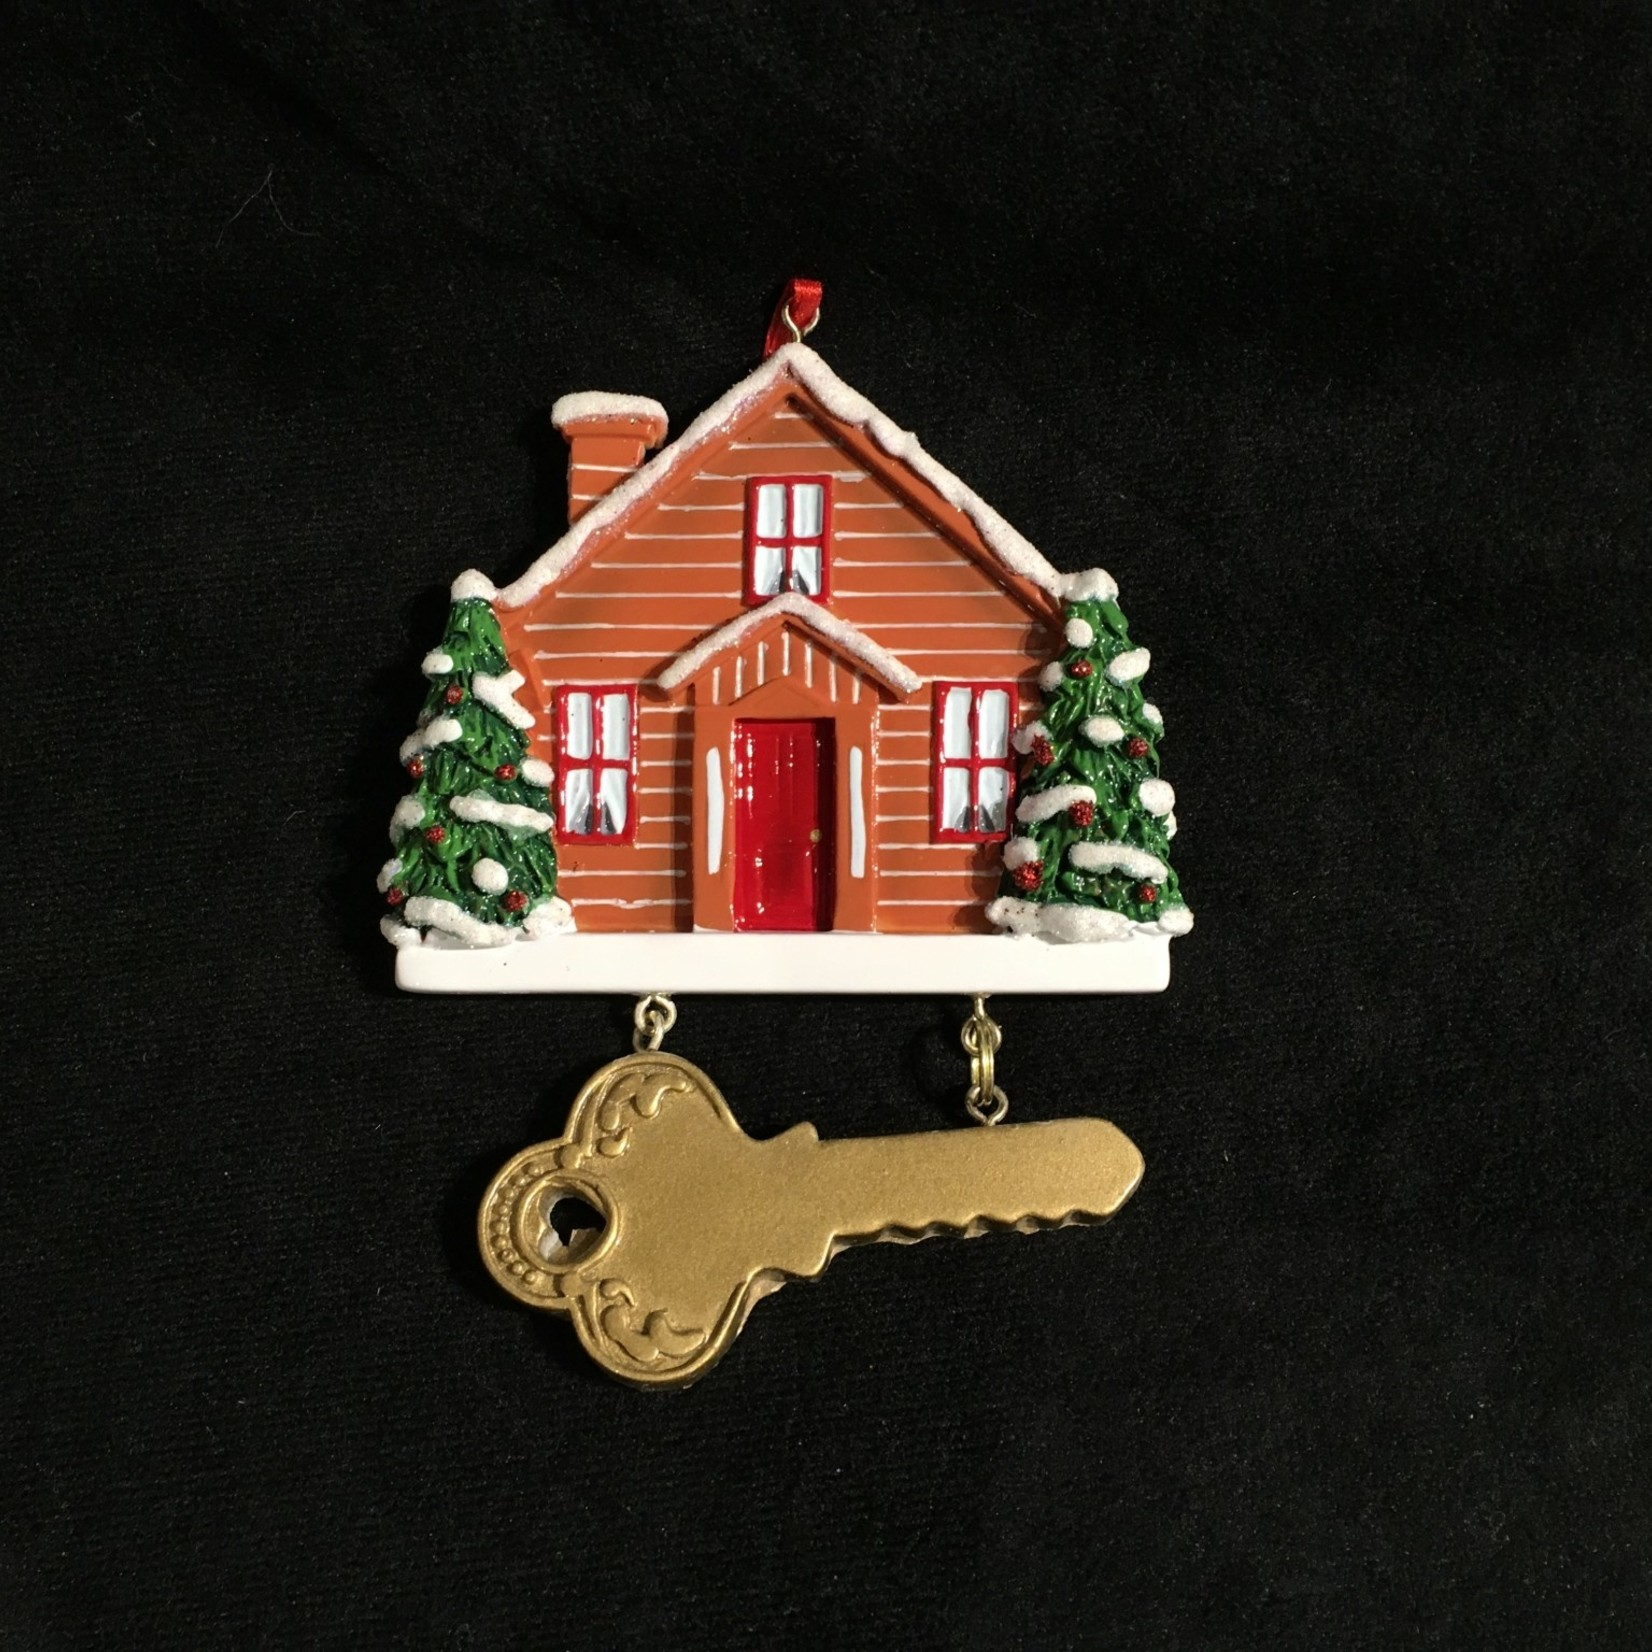 New Home w/Key Orn